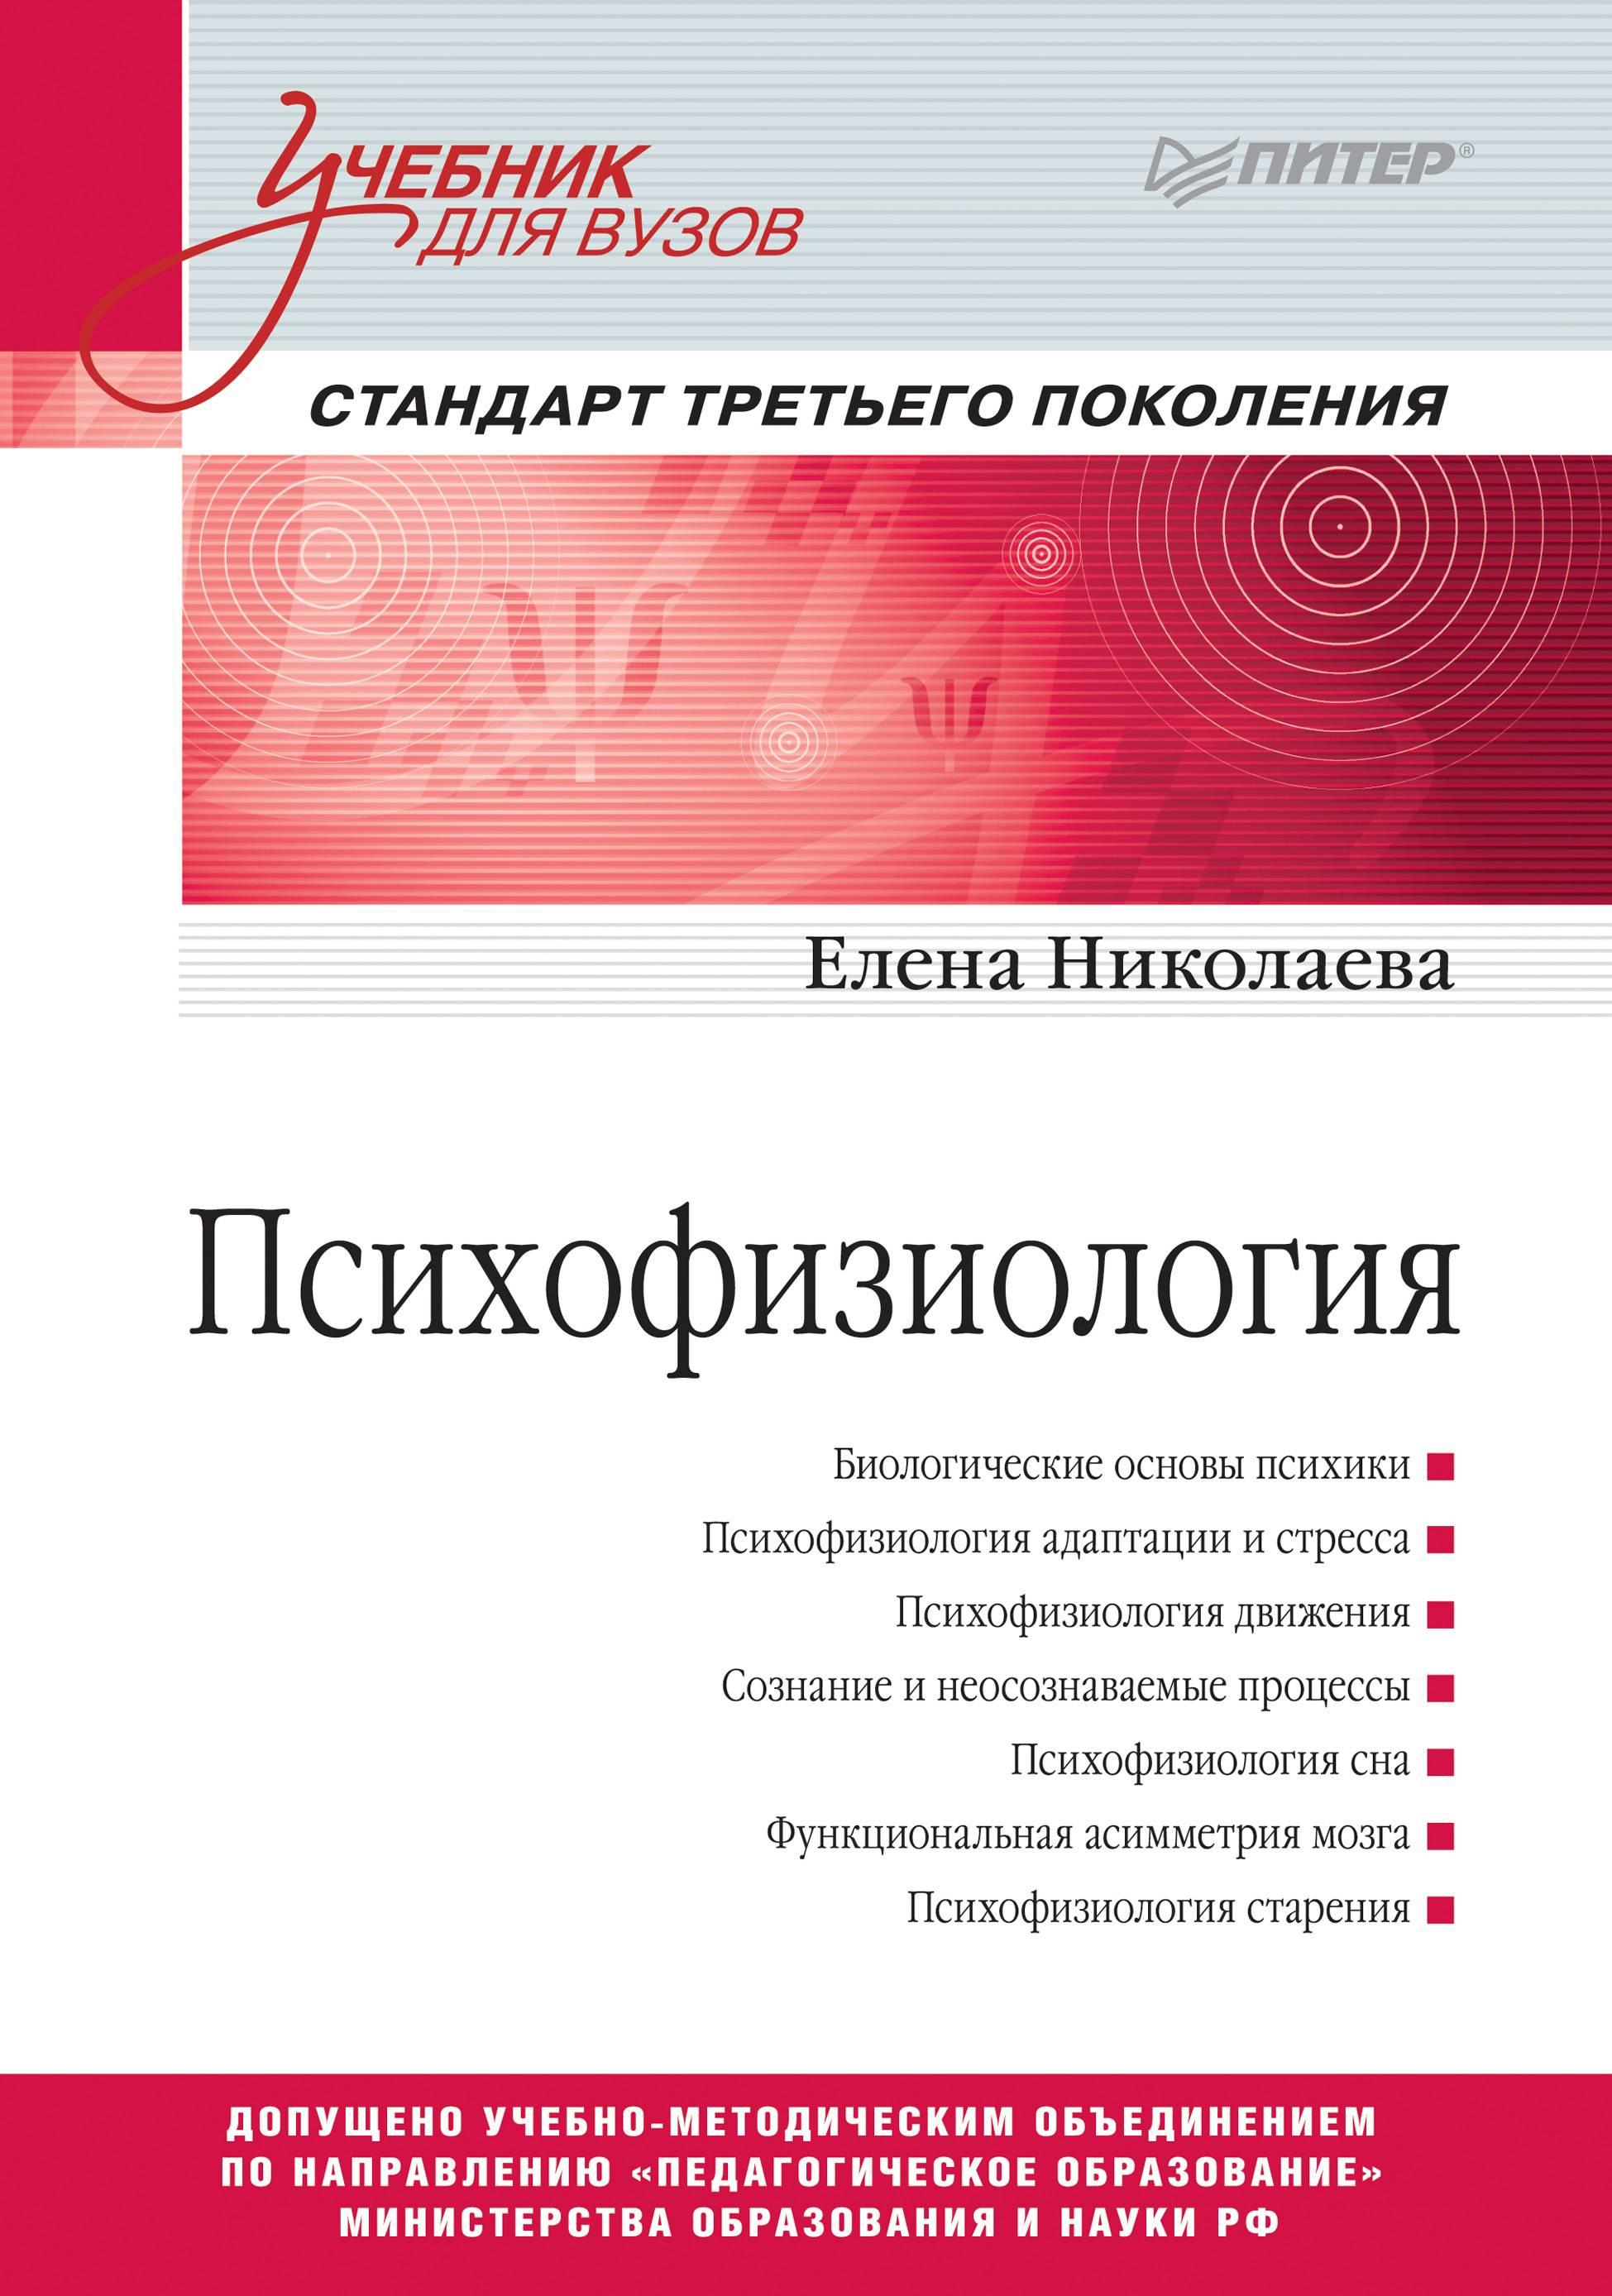 Кафедра психофизиологии